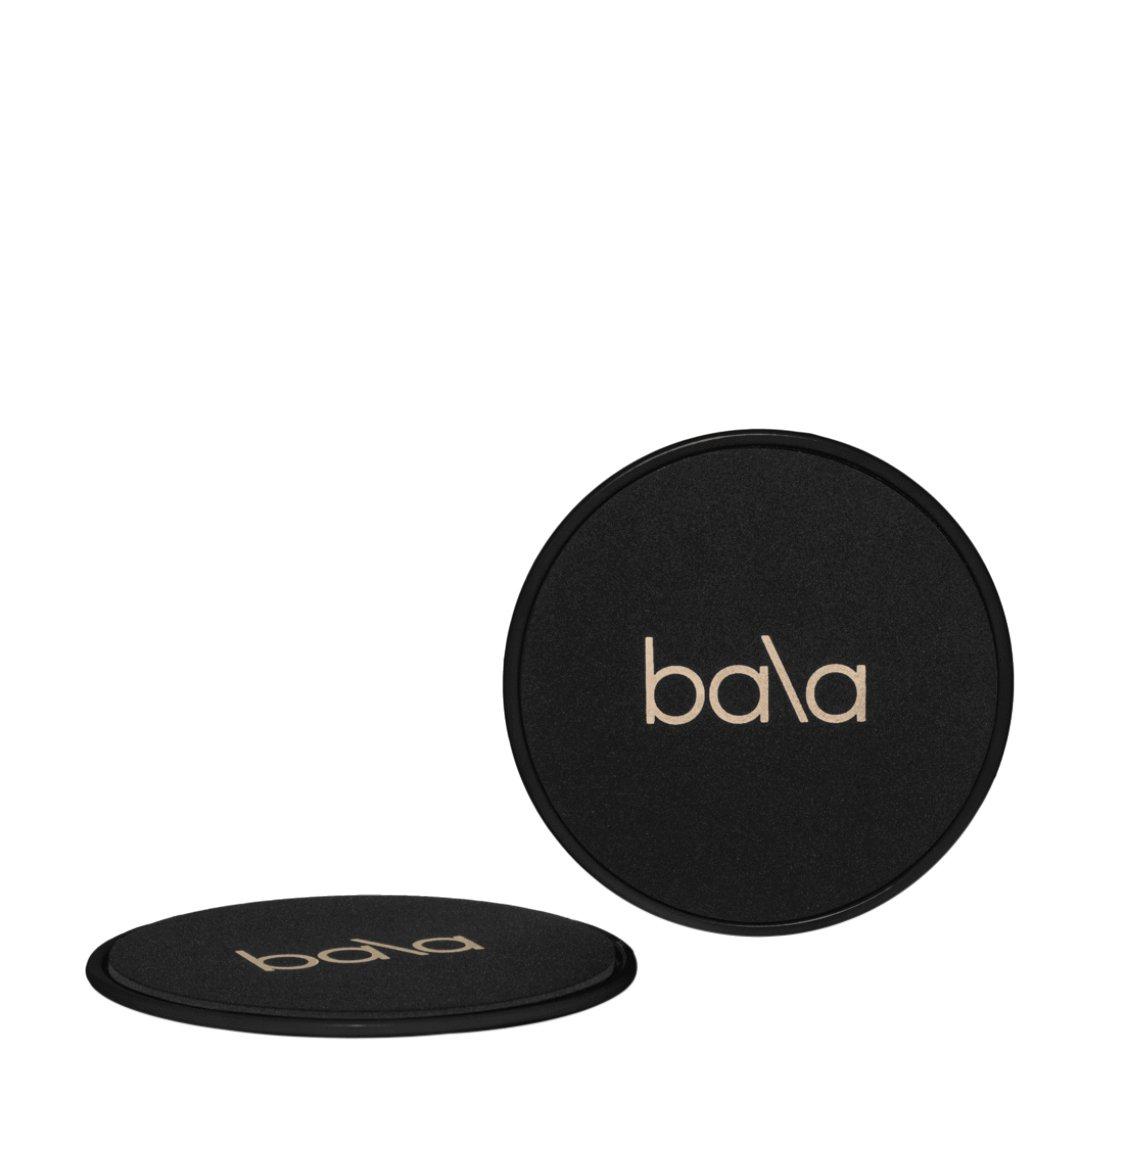 Bala Sliders Δίσκοι Ολίσθησης 2 Τεμάχια